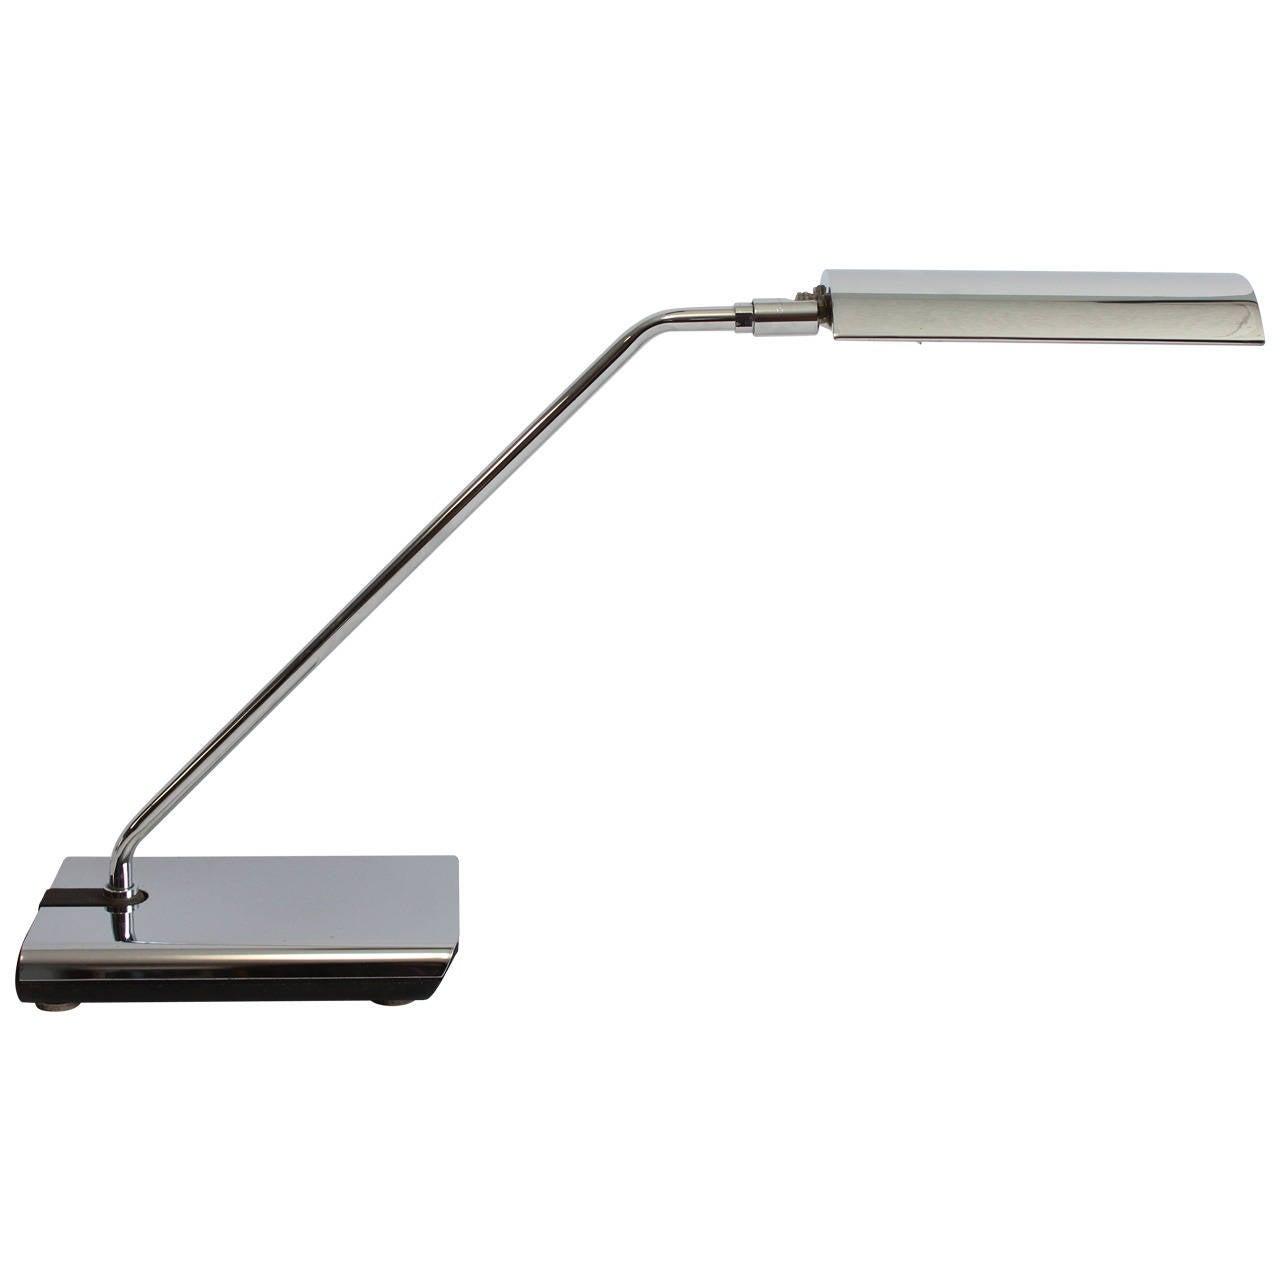 Stylish 1970s Chrome Desk Lamp by Koch & Lowy